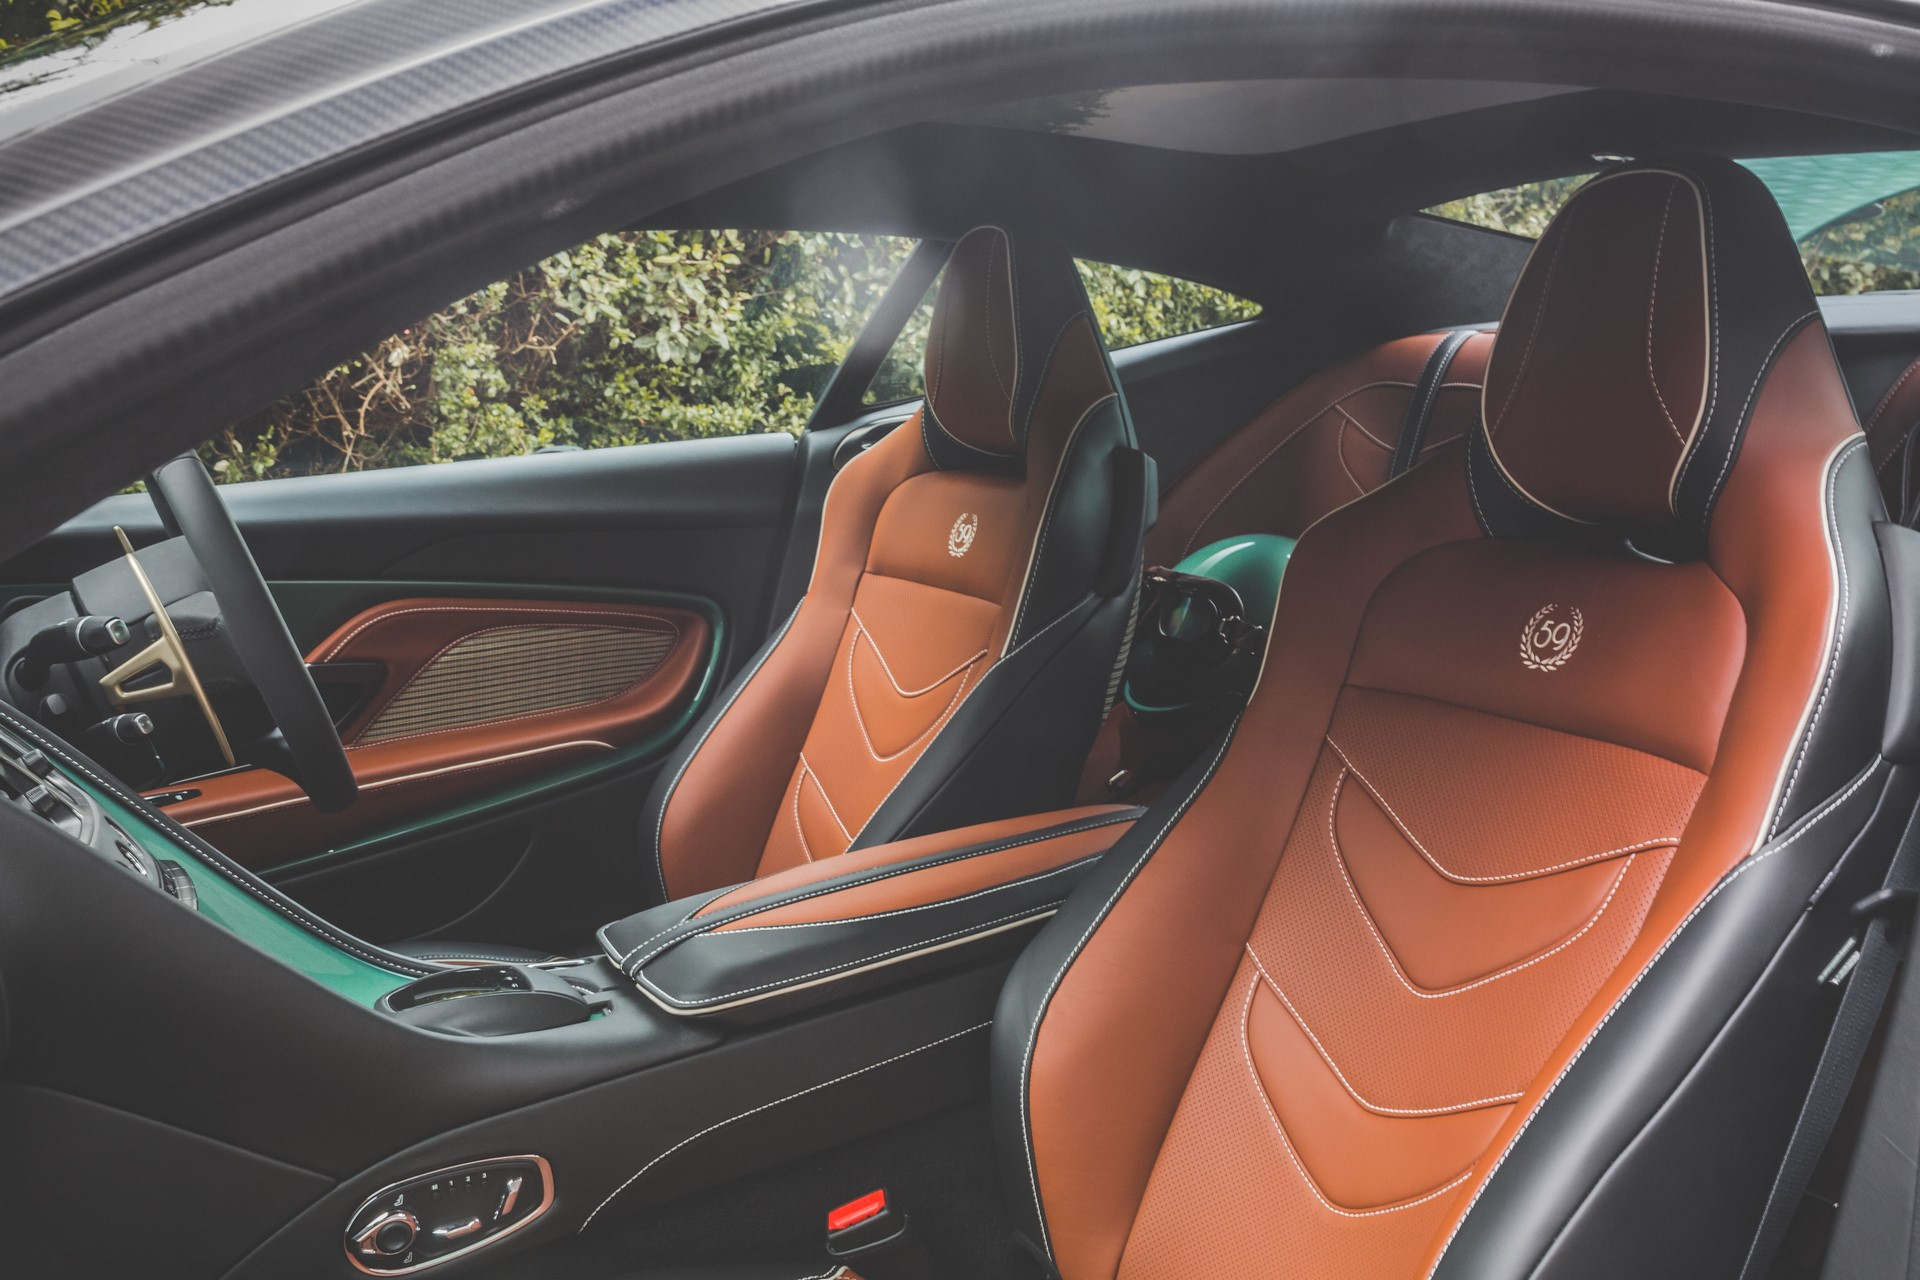 Aston-Martin-DBS-59-Edition-12